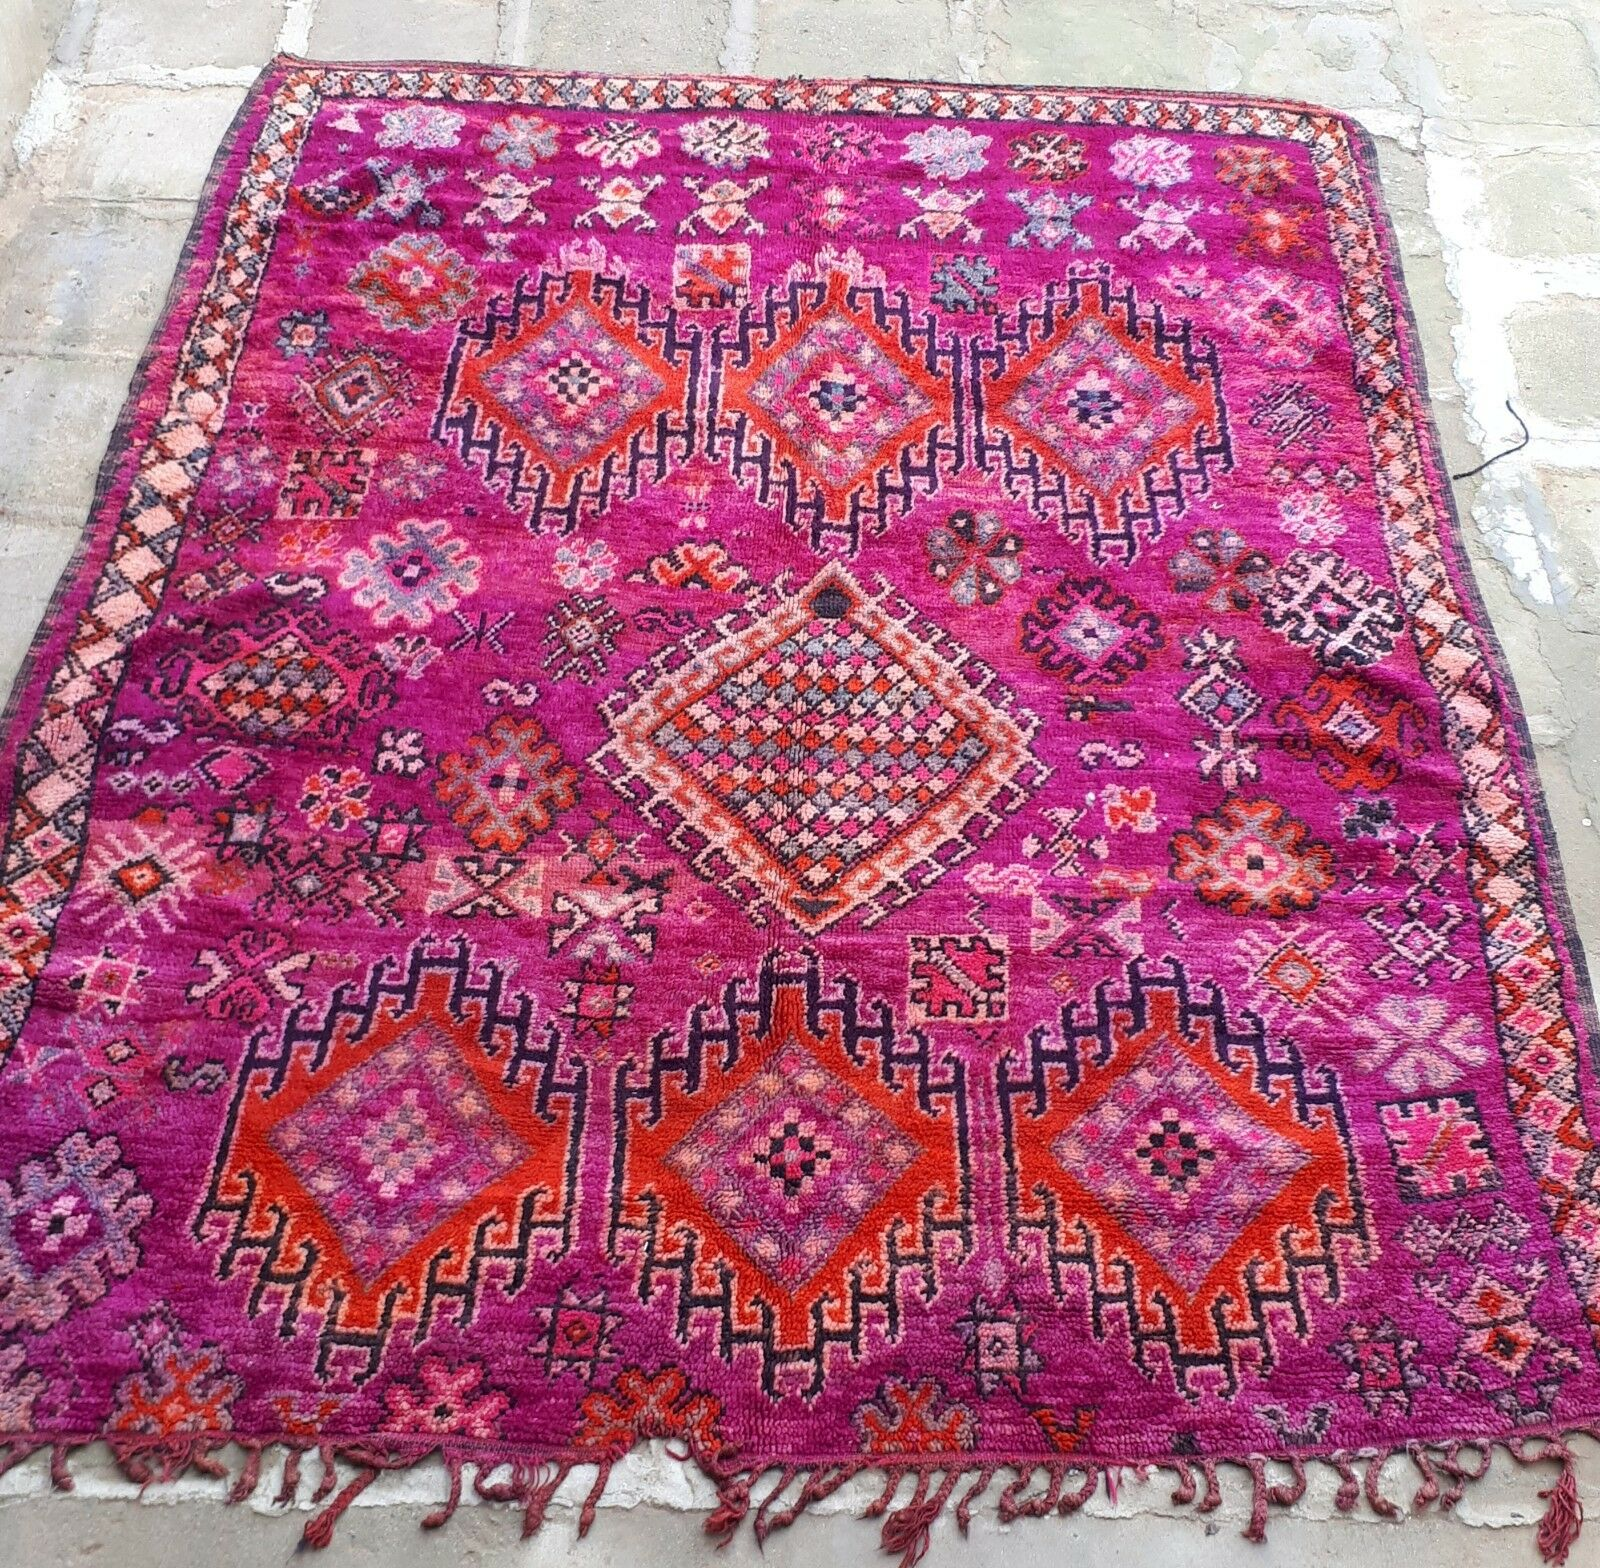 MGoldccan Boujaad Boujaad Boujaad woollen rug 258 x 215cm 210adc